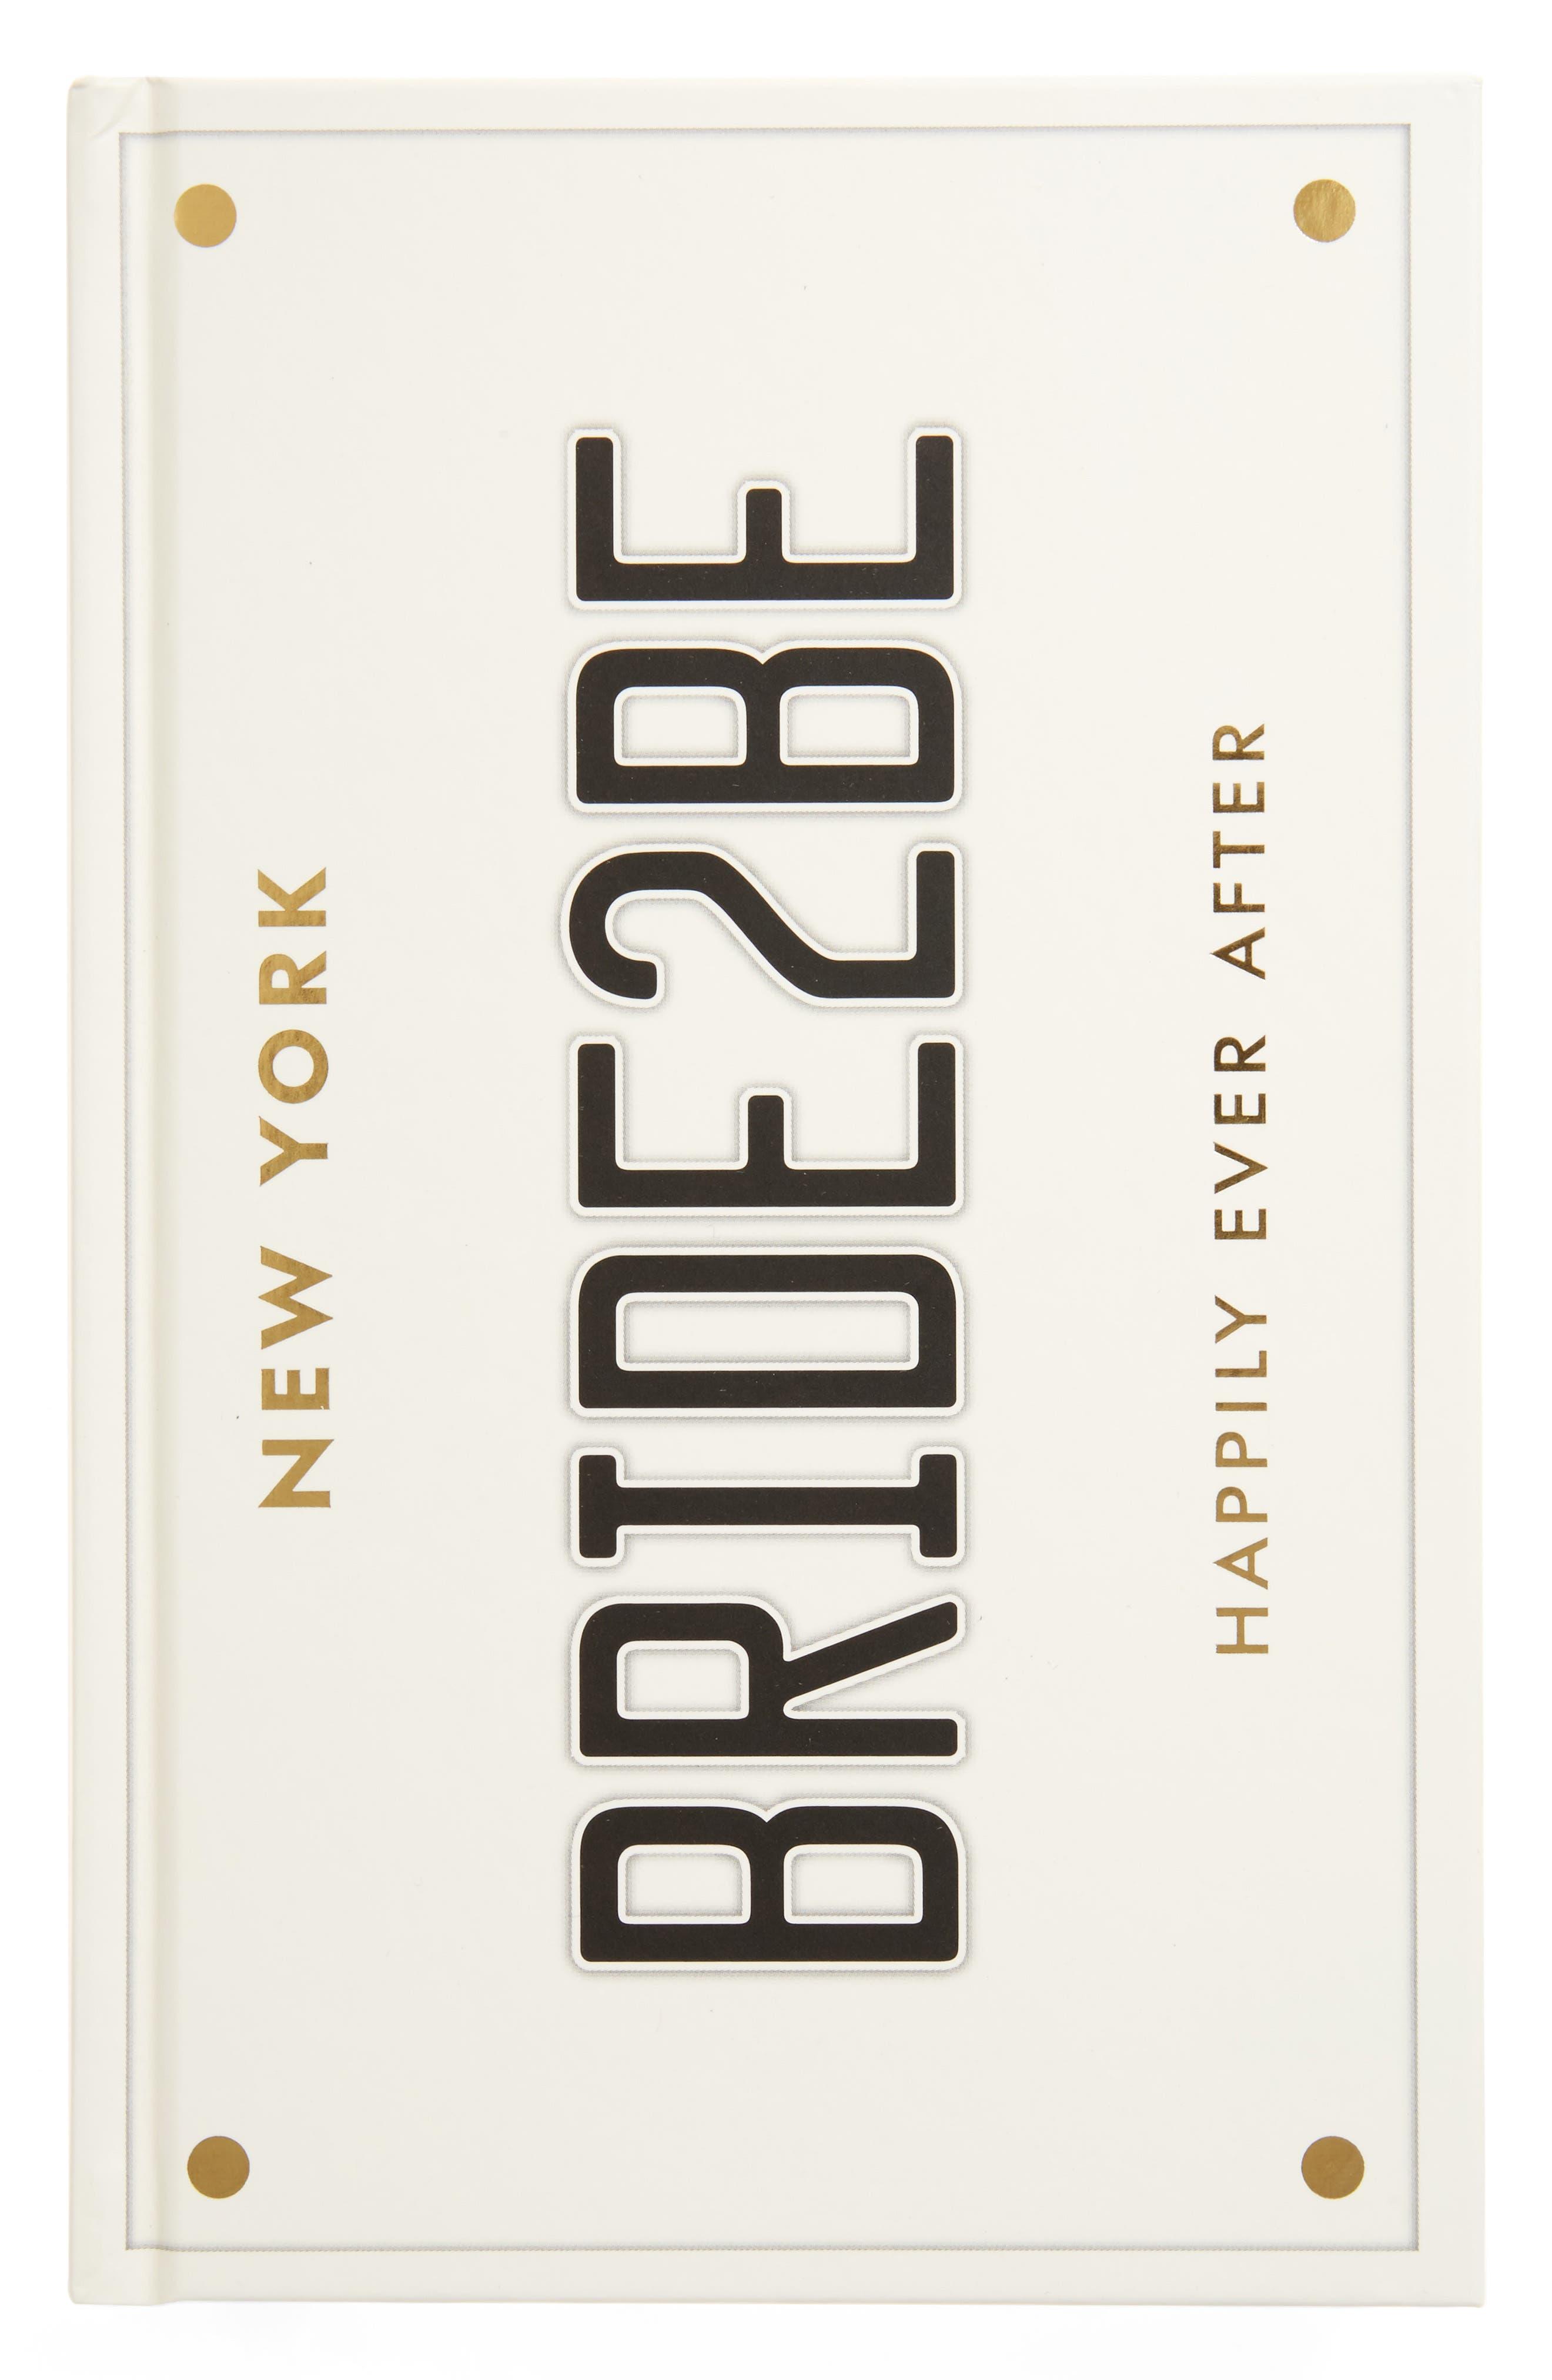 KATE SPADE NEW YORK bridal notebook, Main, color, 100